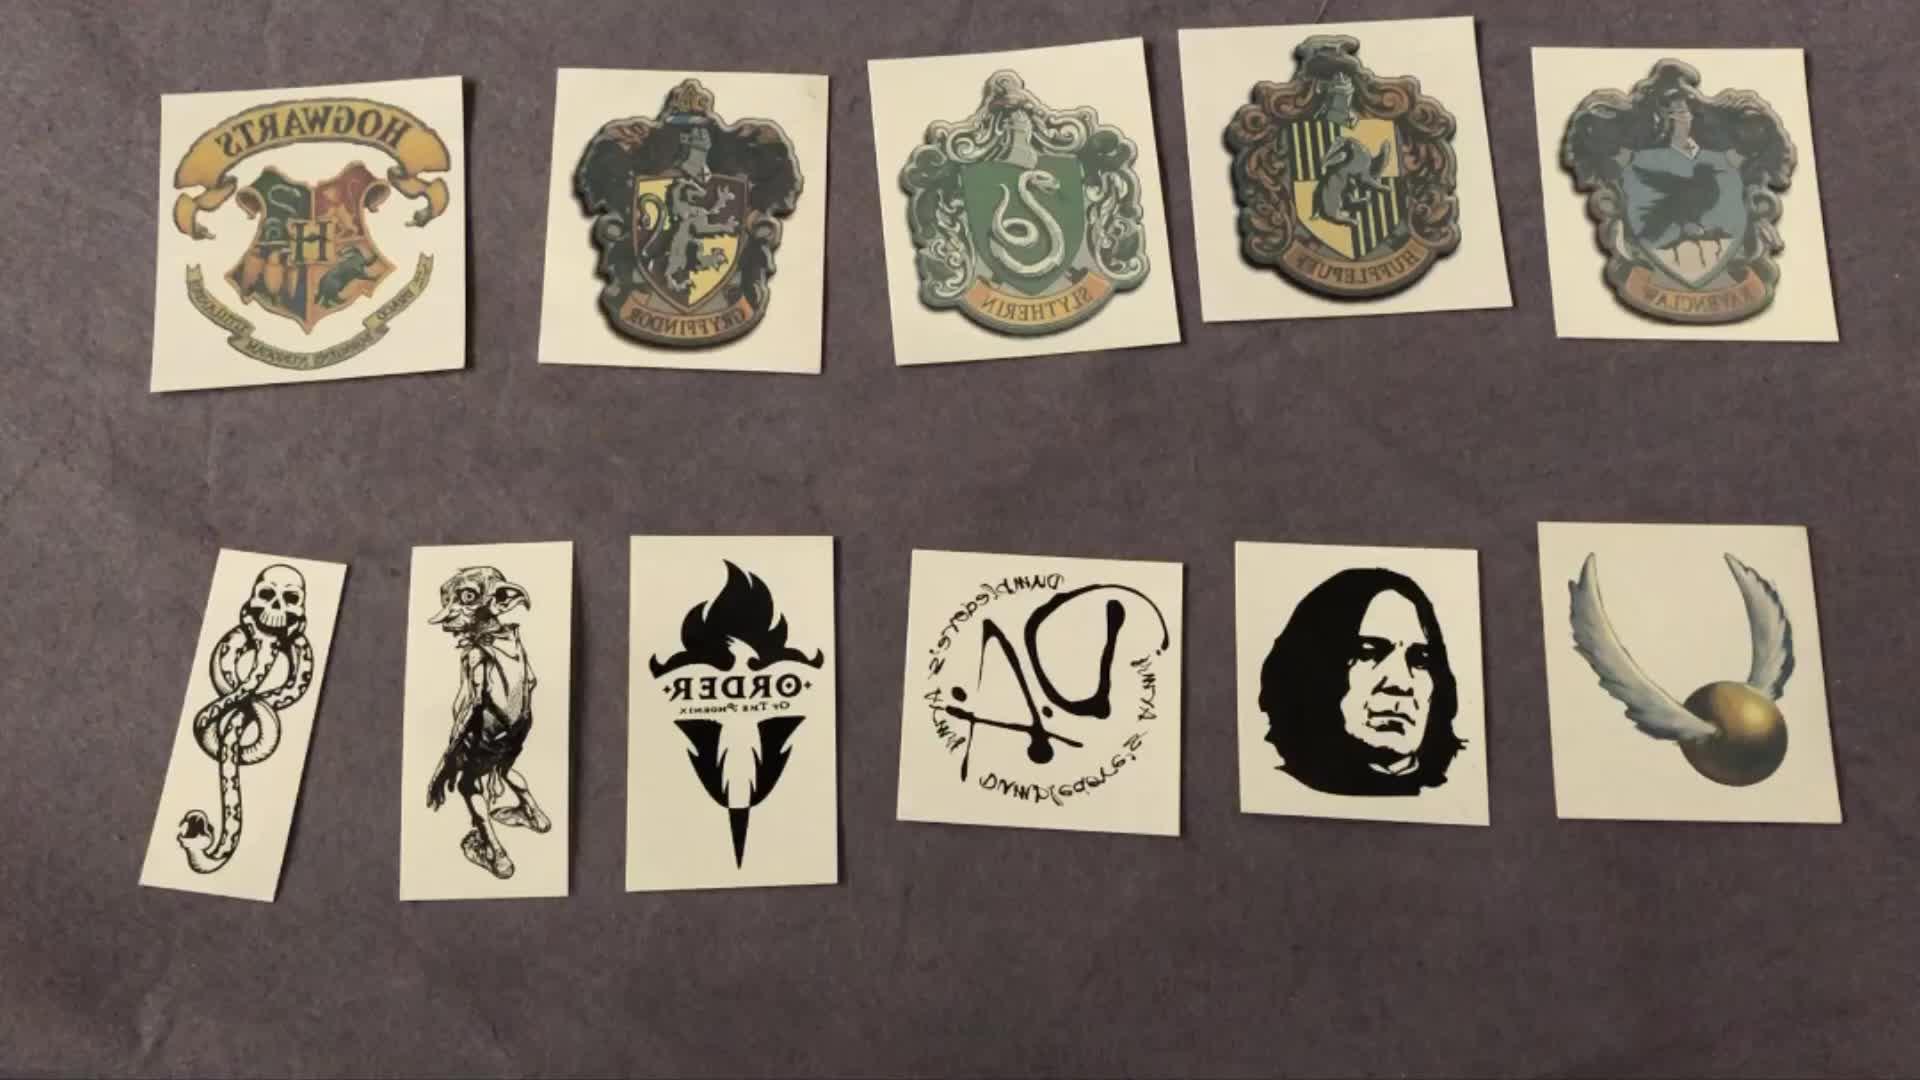 Film Harry Potter Temporaire Lavage Tatouage Mangemort Poudlard Gryffondor autocollants De Tatouage